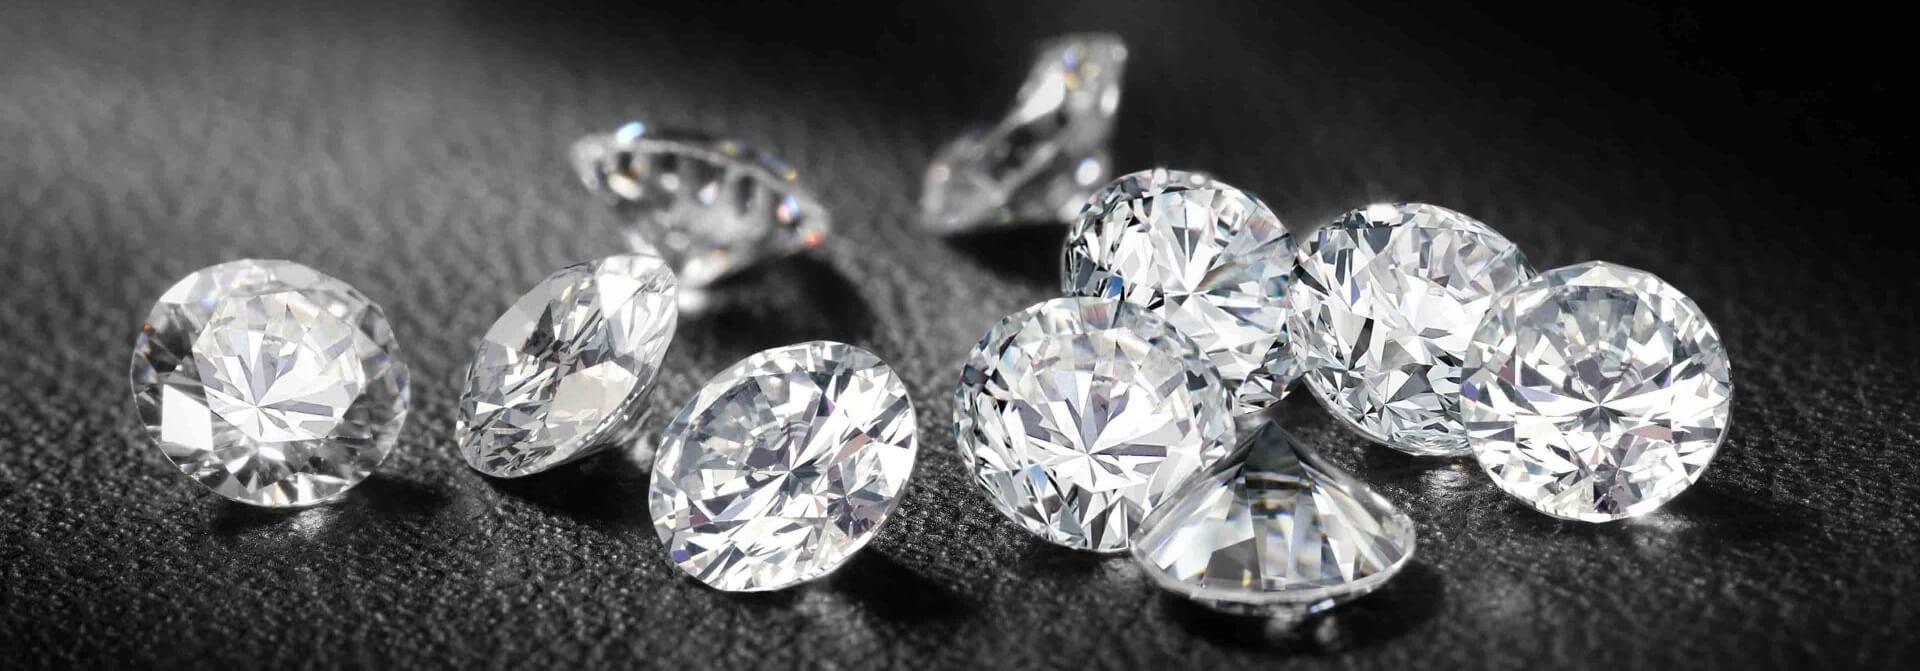 lab grown diamonds faq